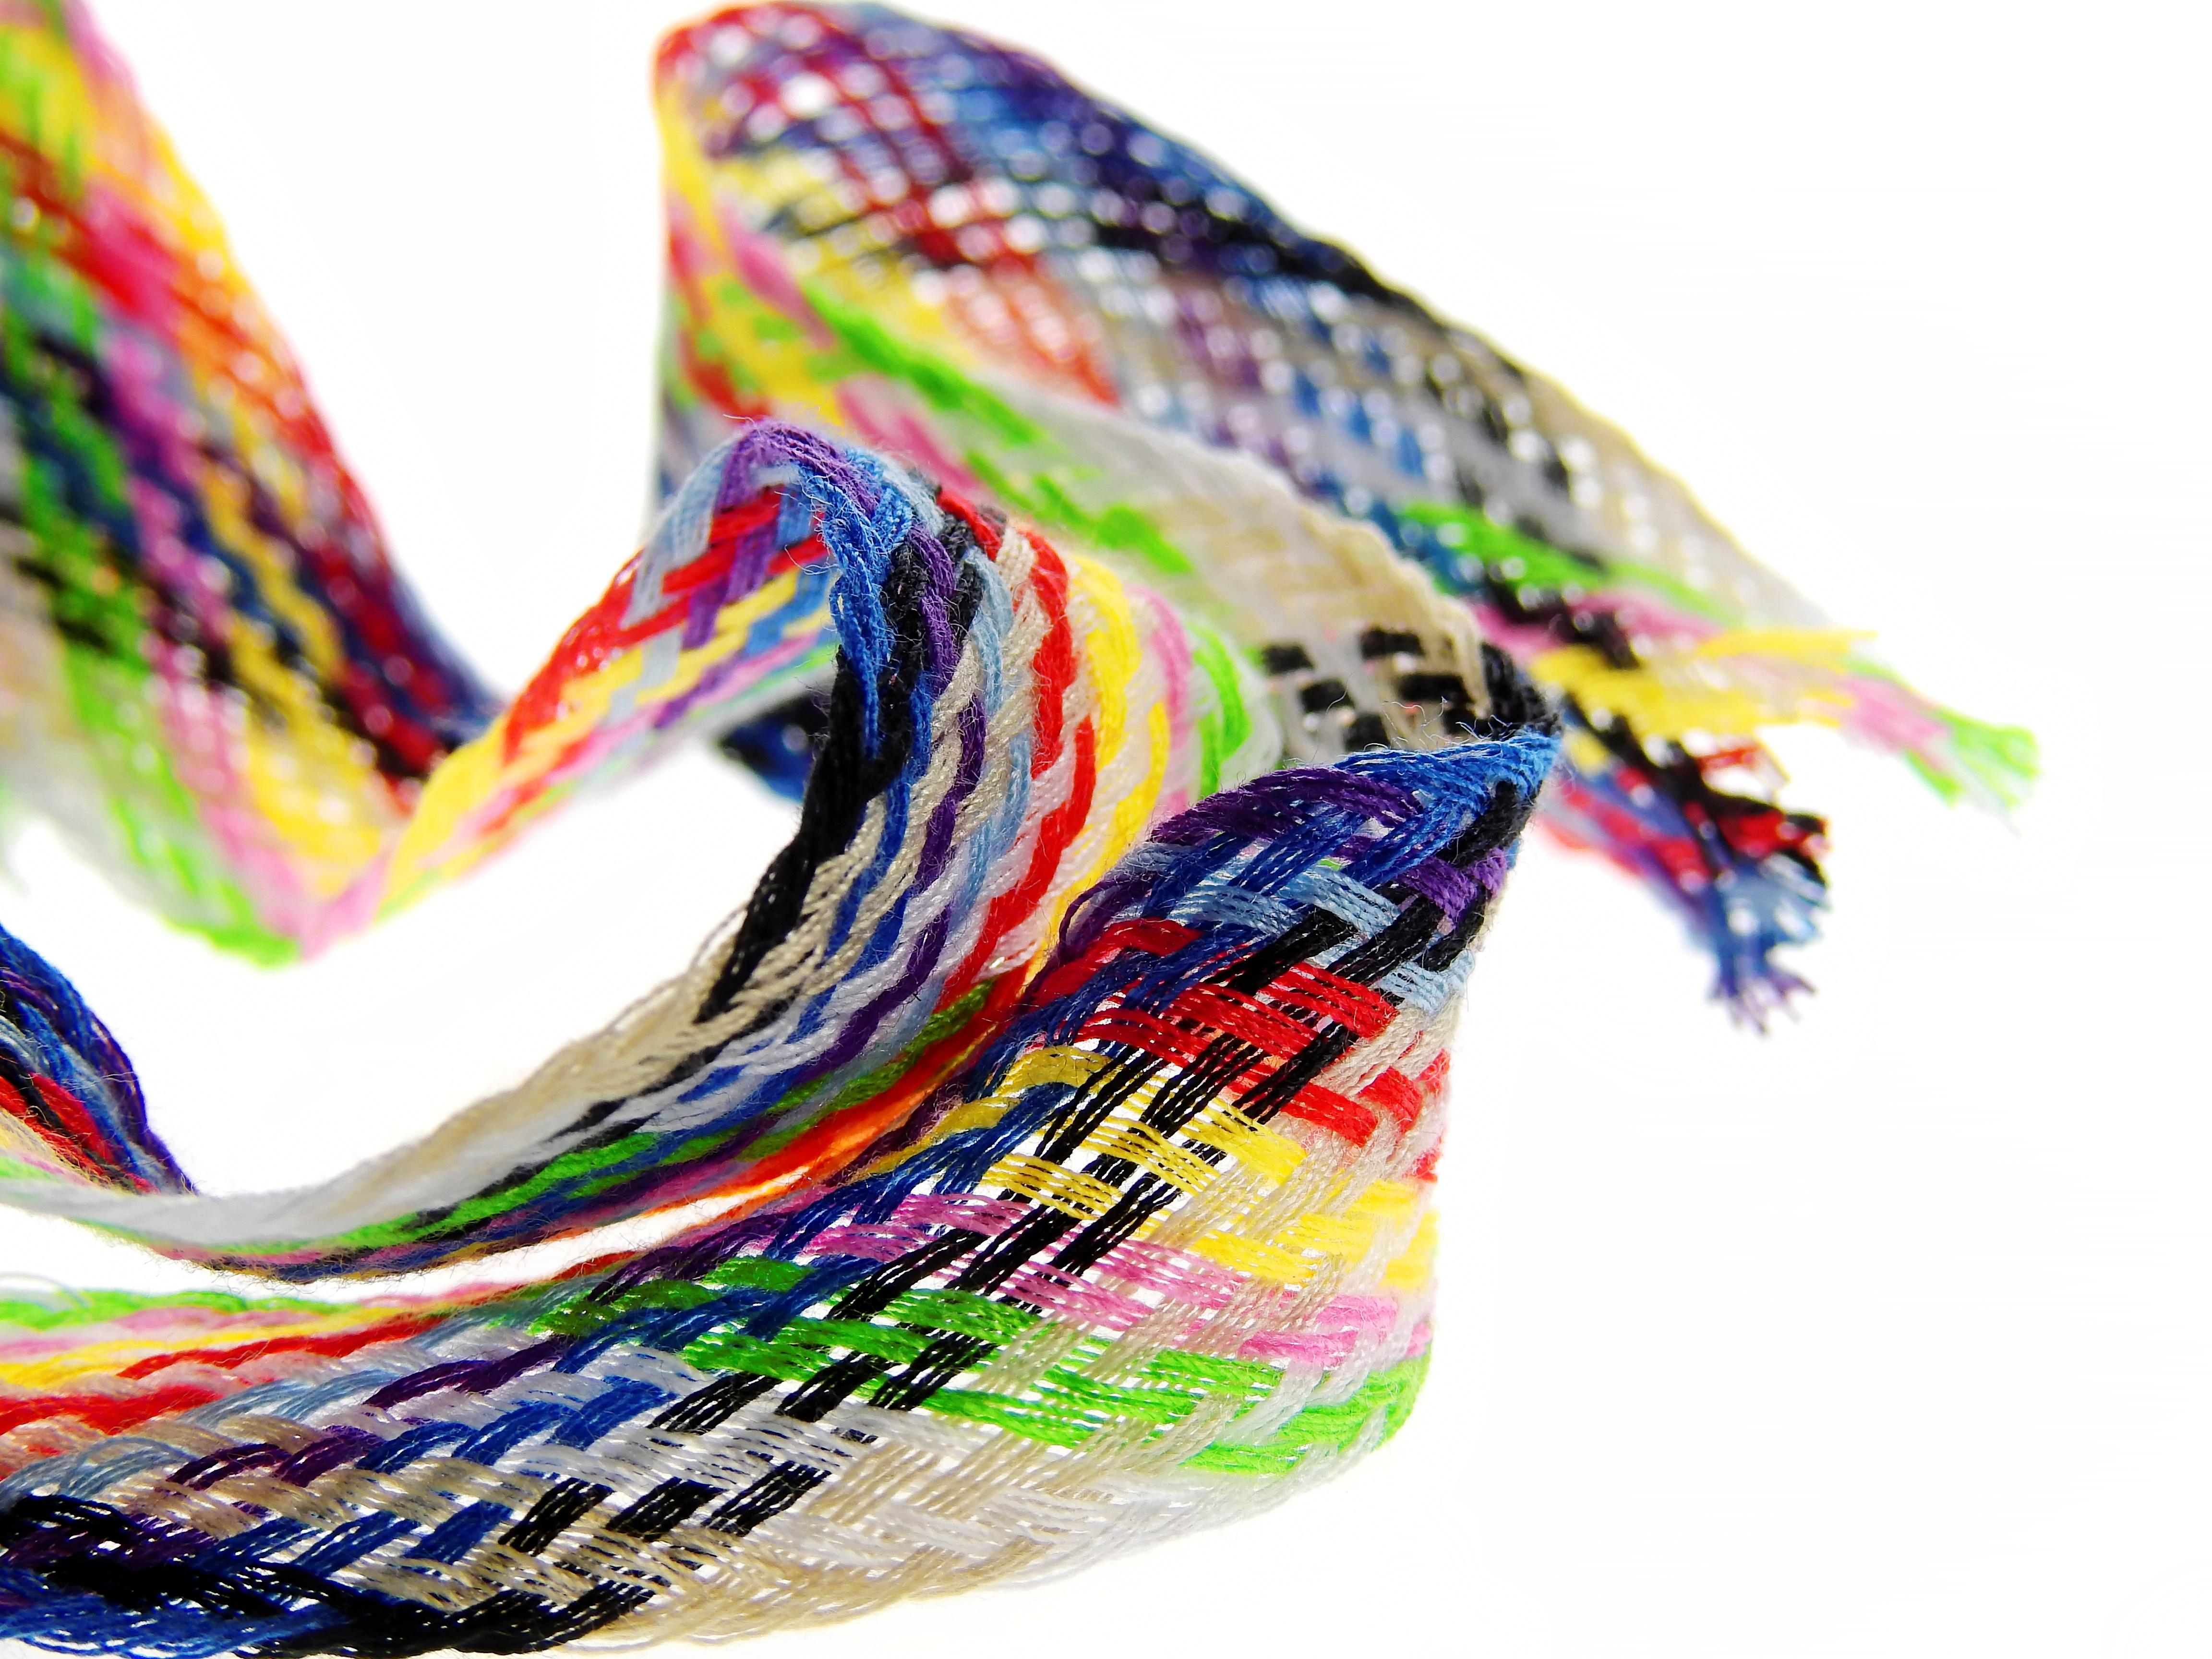 Kostenlose foto : Schuh, kreativ, Muster, Farbe, Mode, Kunst ...